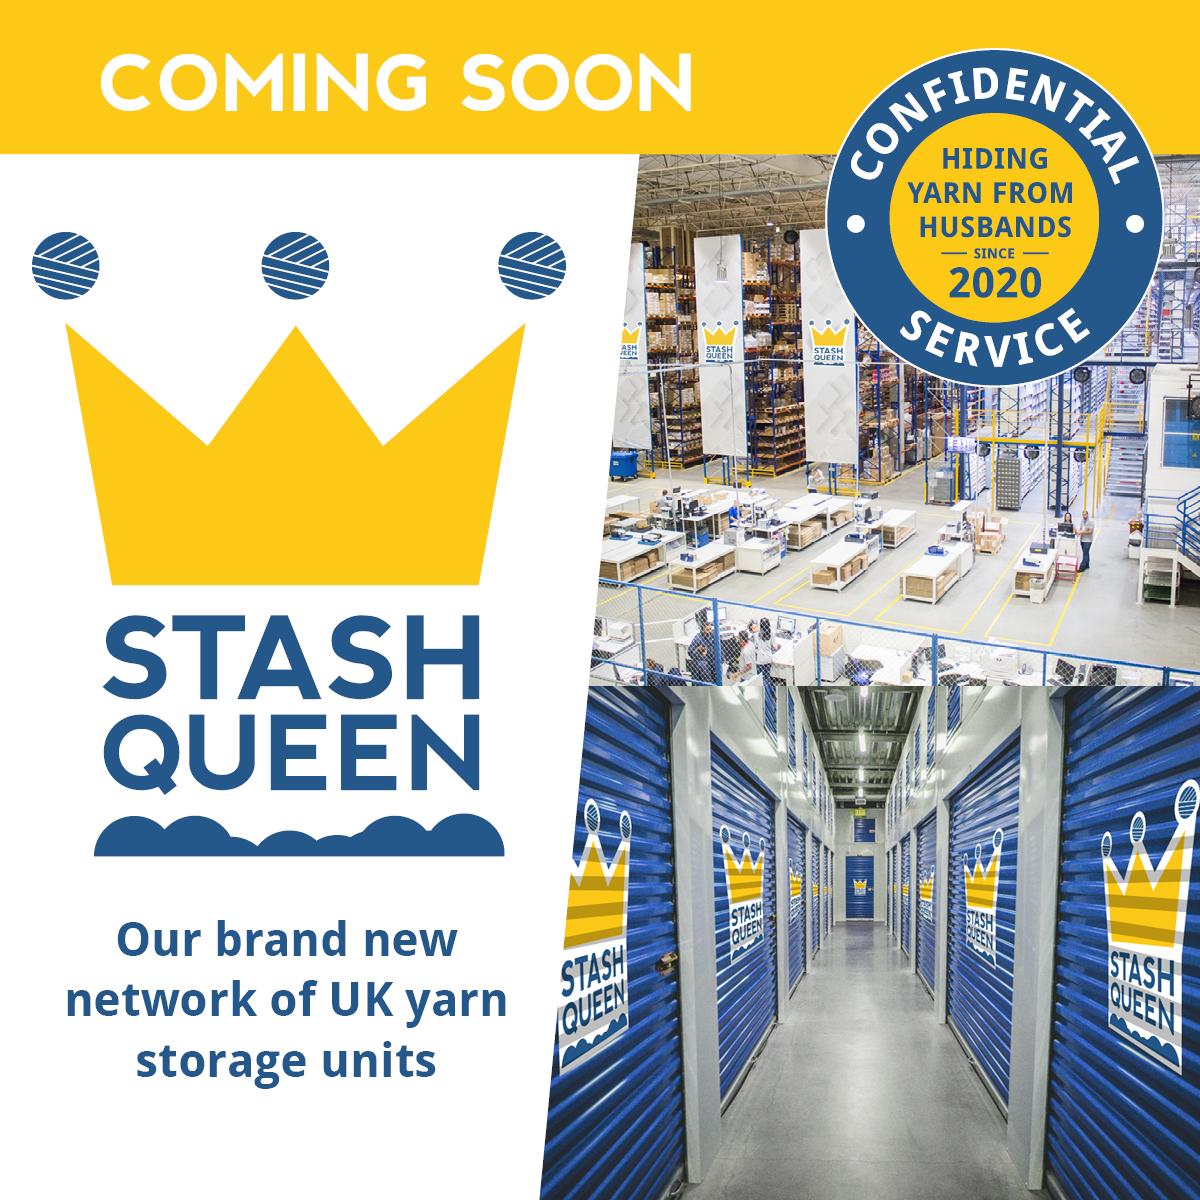 New UK Yarn Storage Network